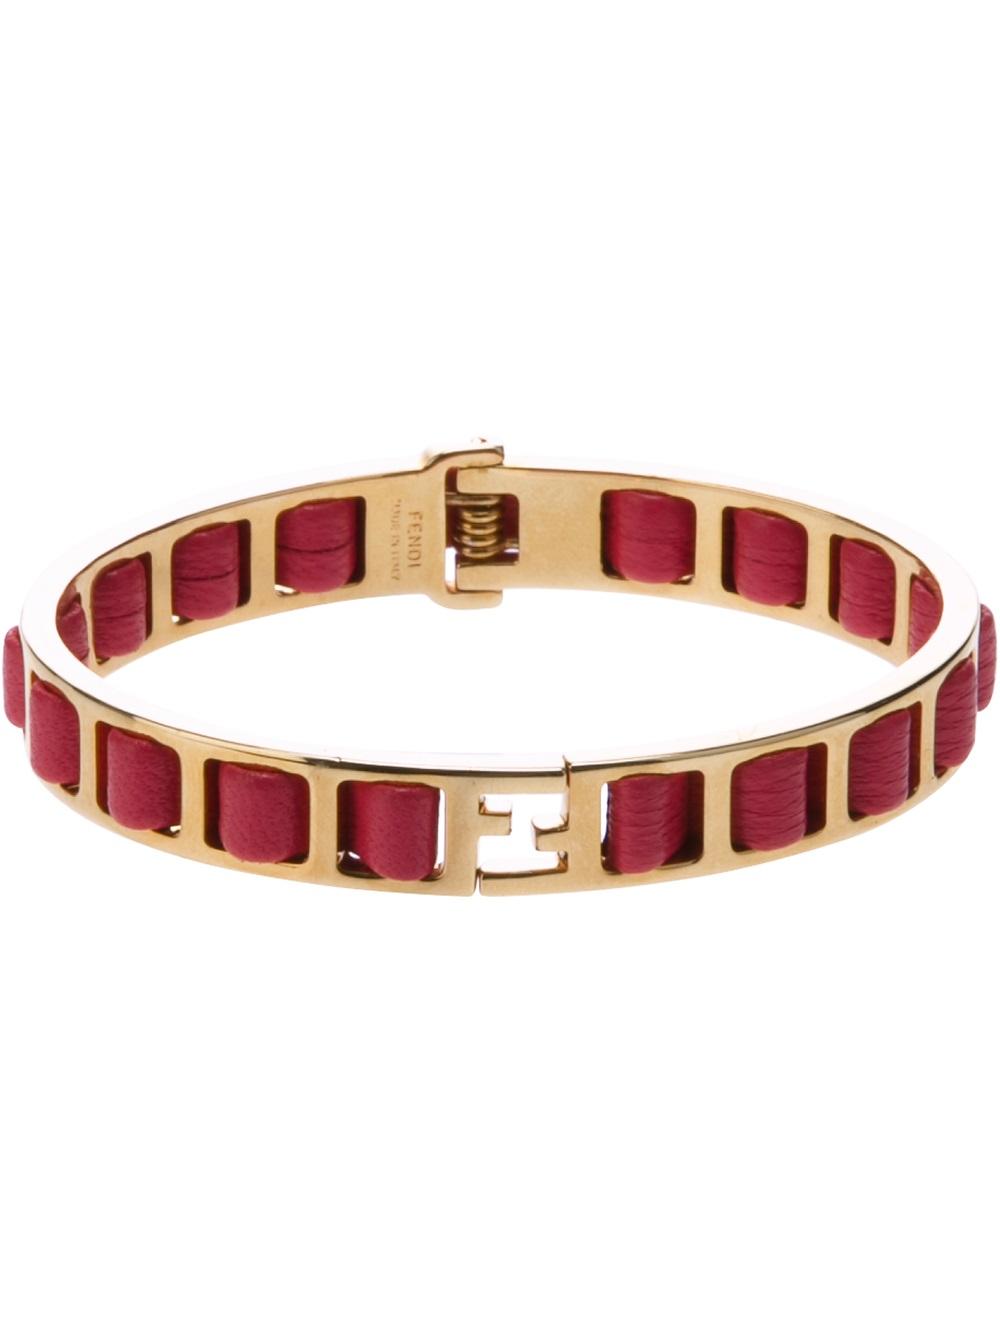 Fendi logo plaque bracelet - Pink & Purple zDKFB